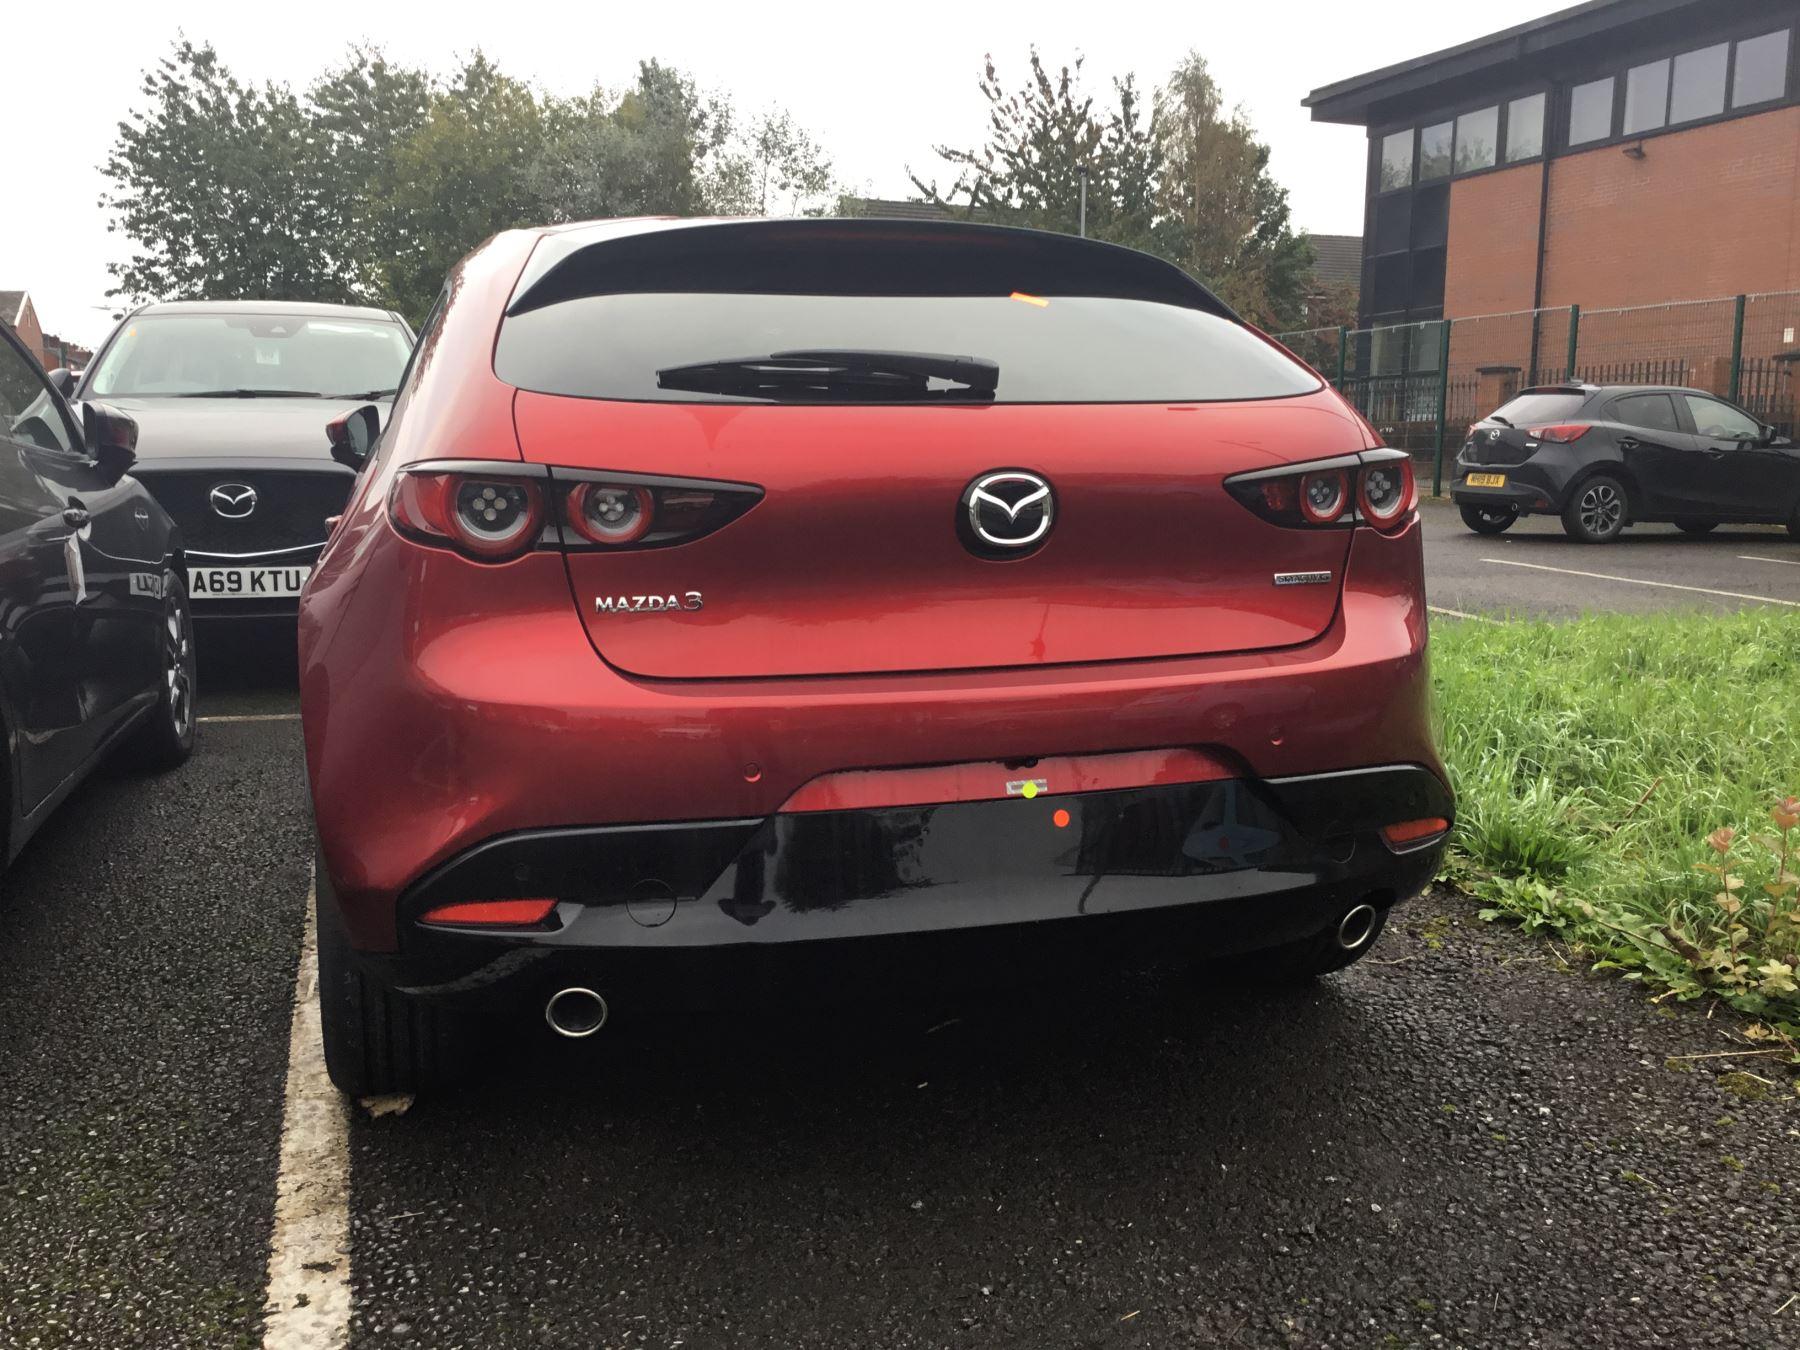 Mazda 3 2.0 Sport Lux image 7